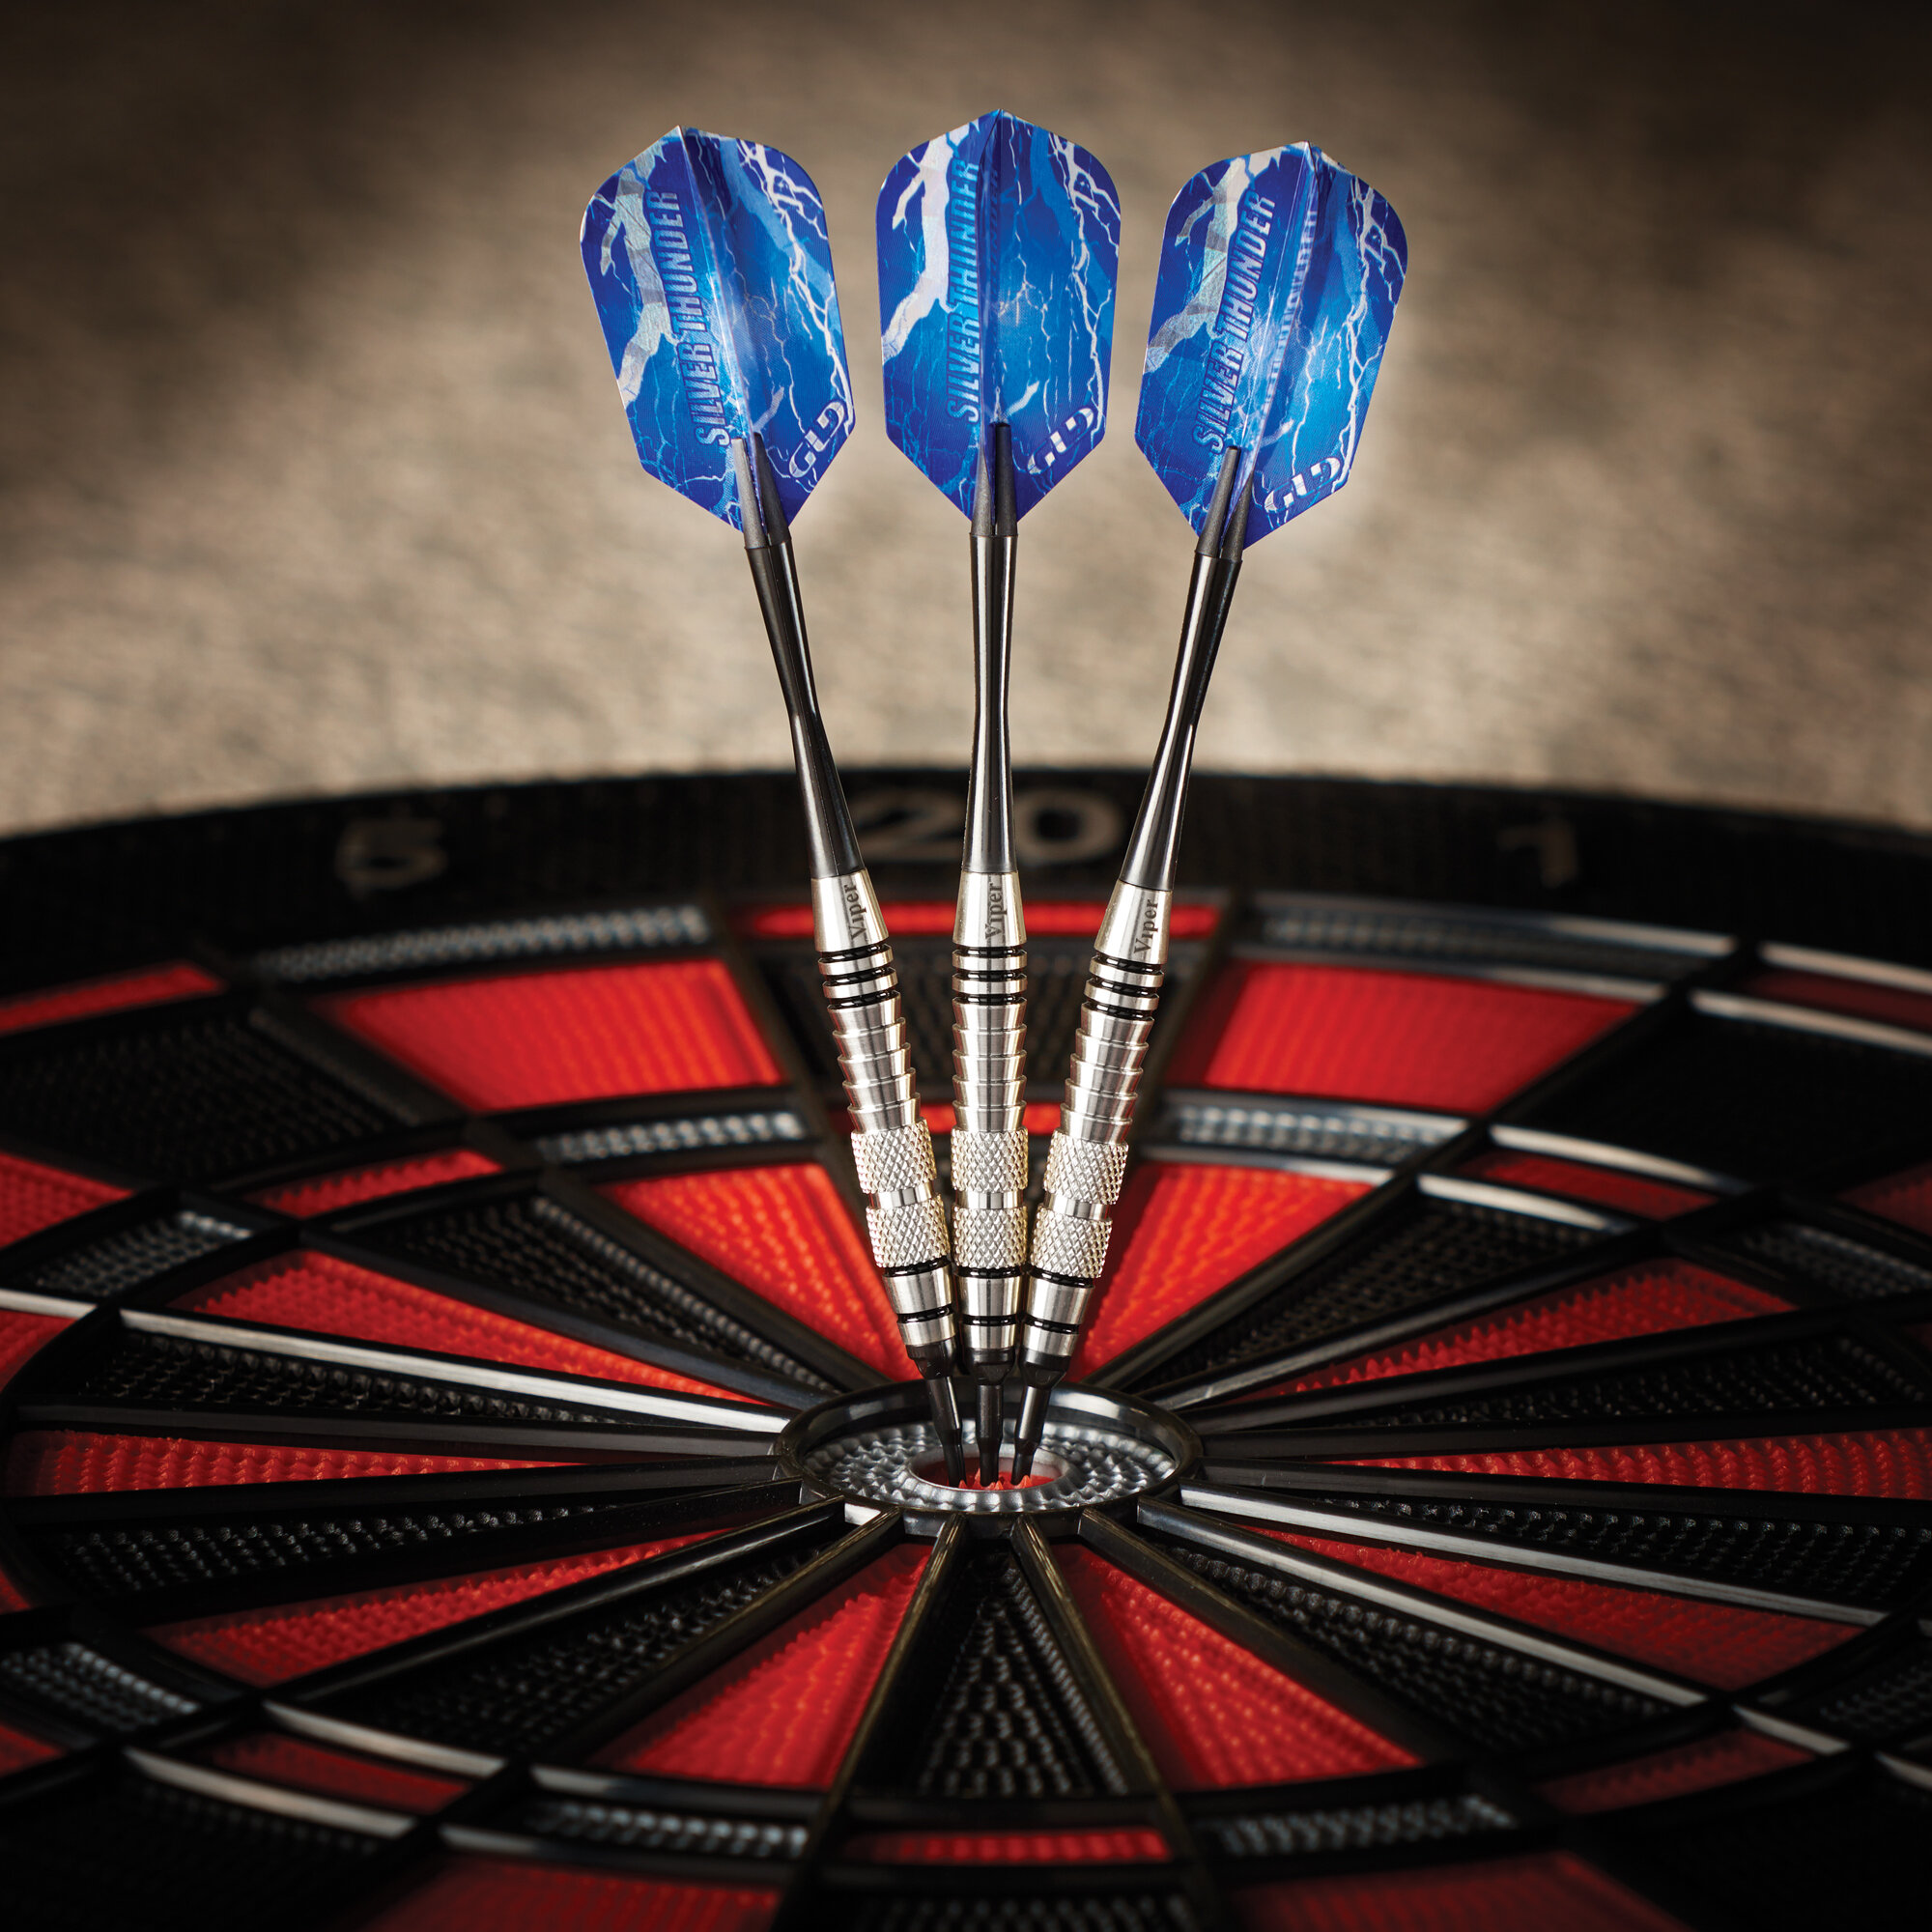 1000 Tufflex SS Soft Dart Tips Short Blue Darts Tip w// FREE Shipping